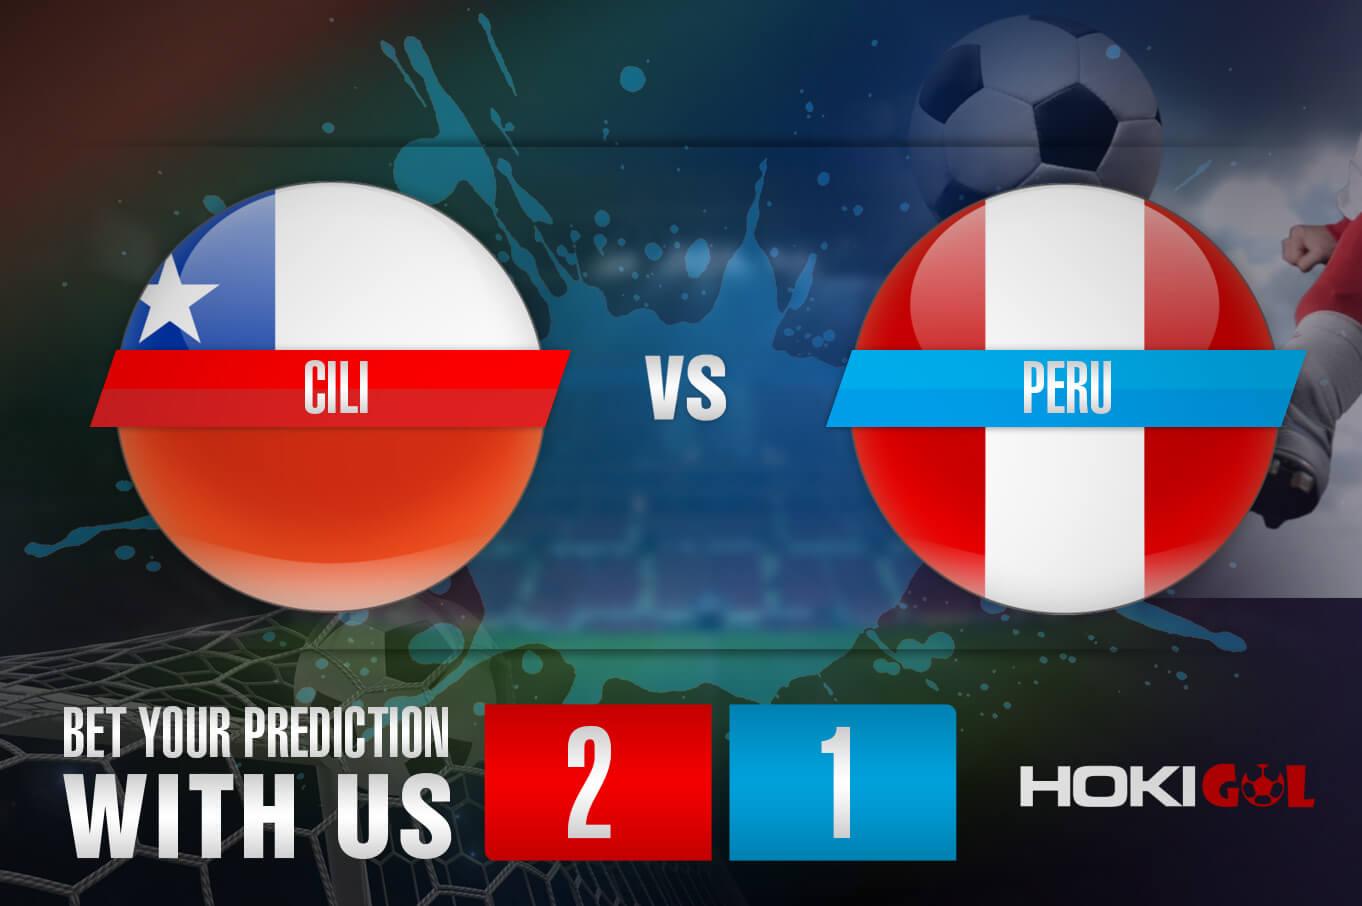 Prediksi Bola Cili Vs Peru 14 November 2020